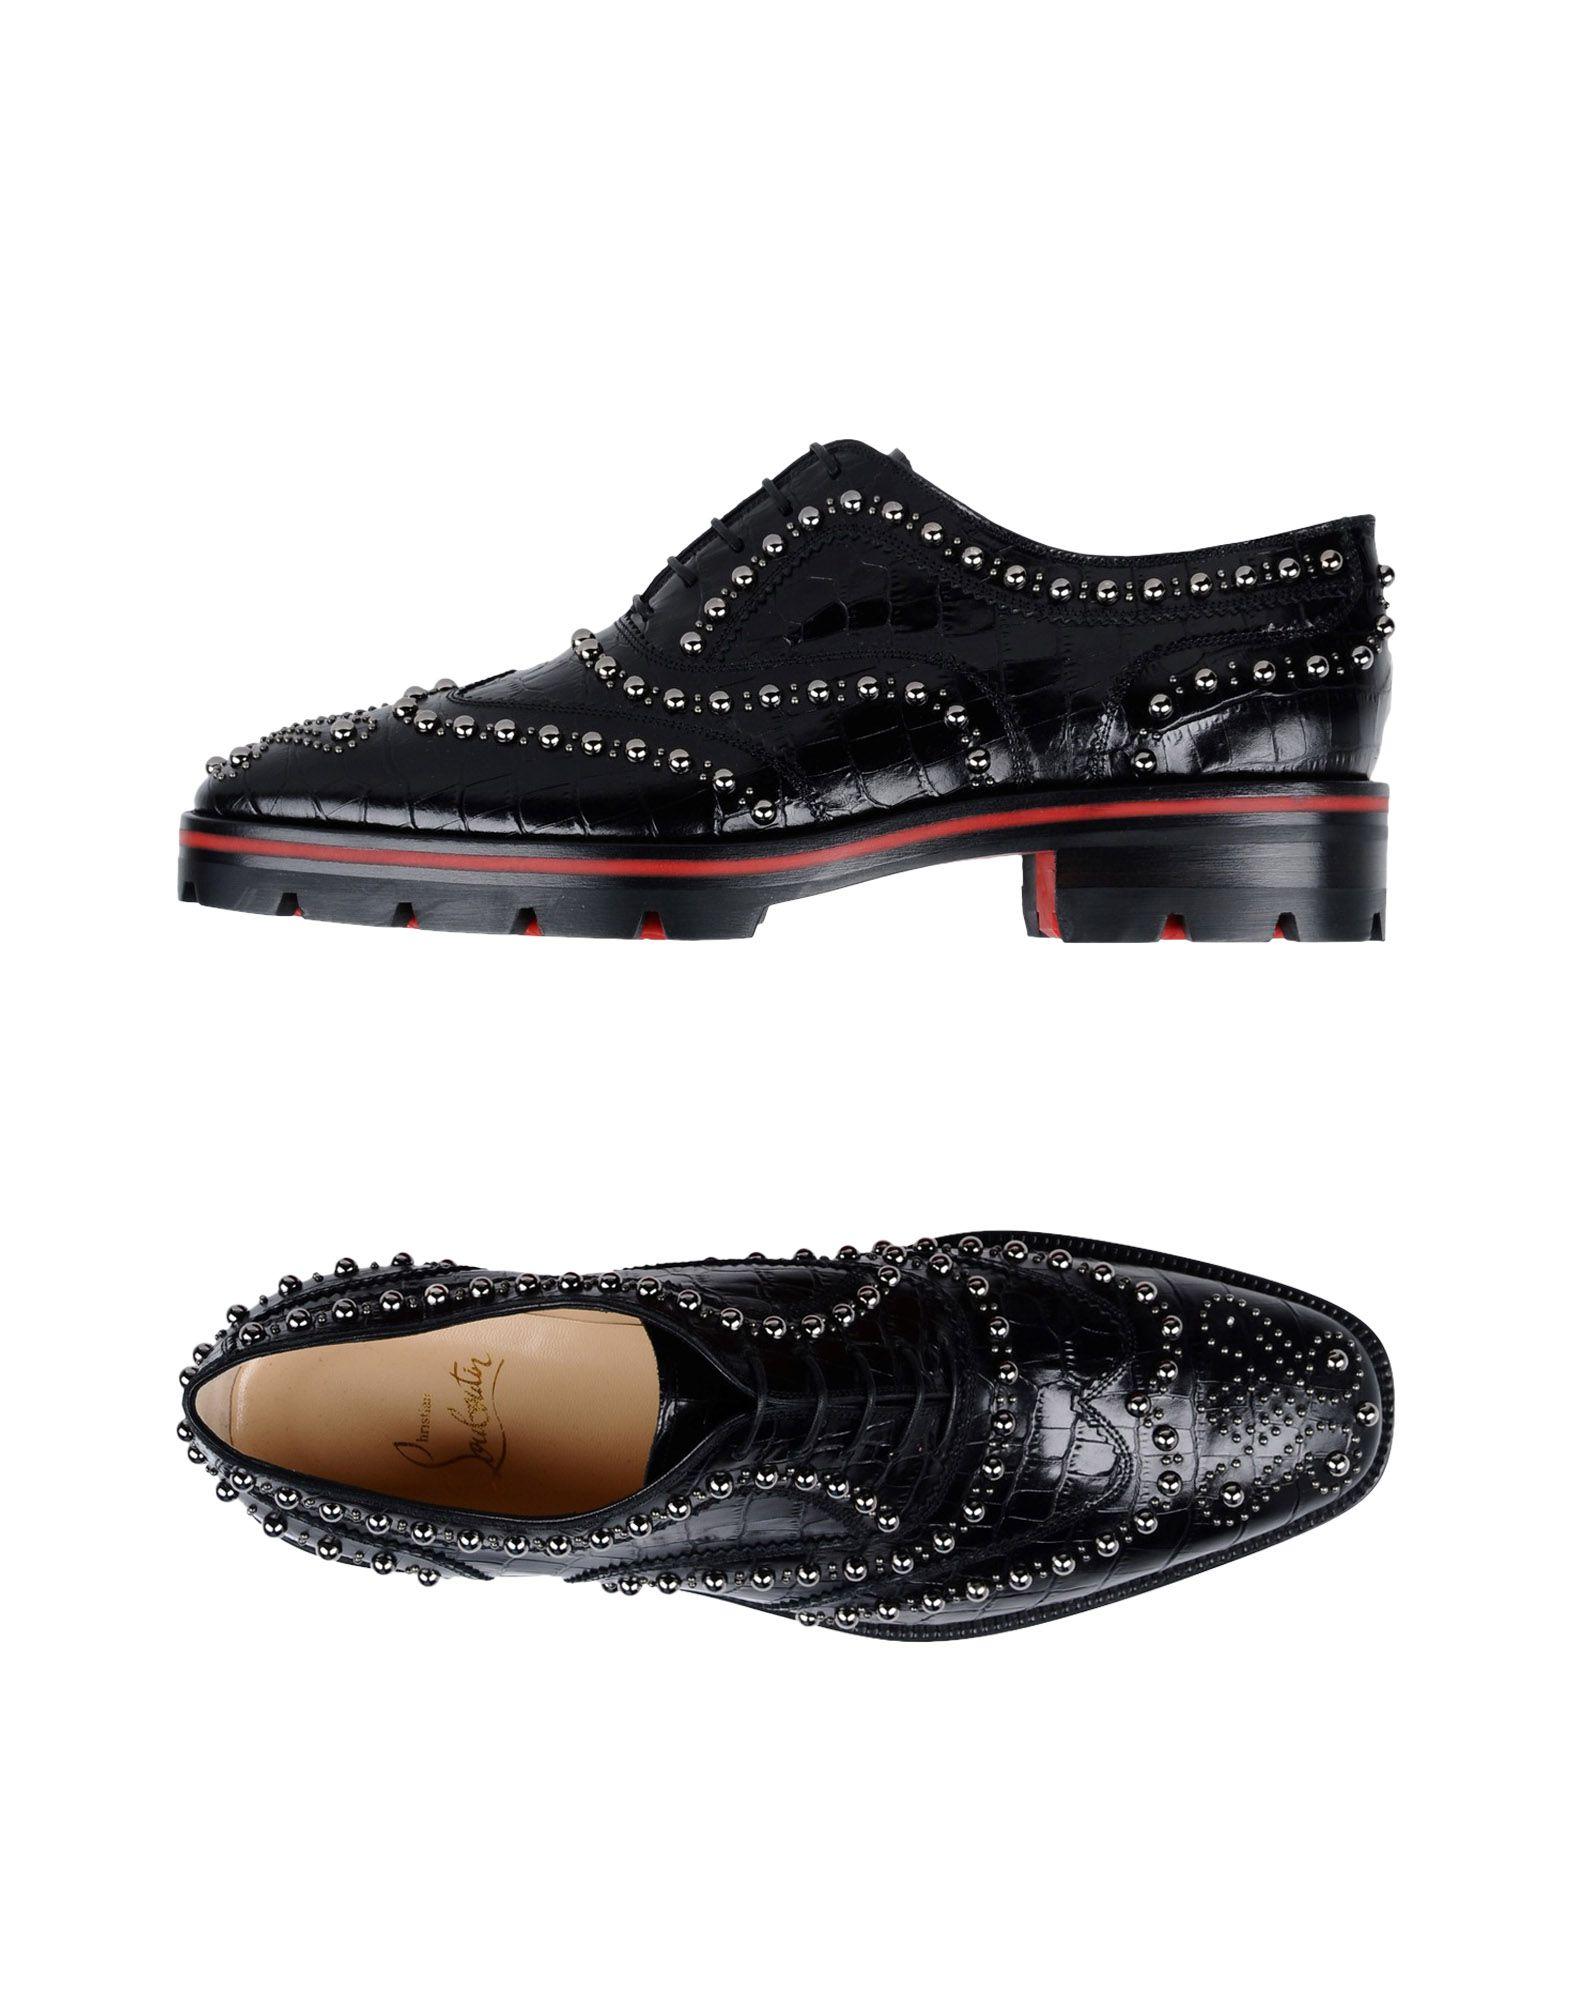 Chaussures - Chaussures À Lacets Cristian G. 3xujblscb